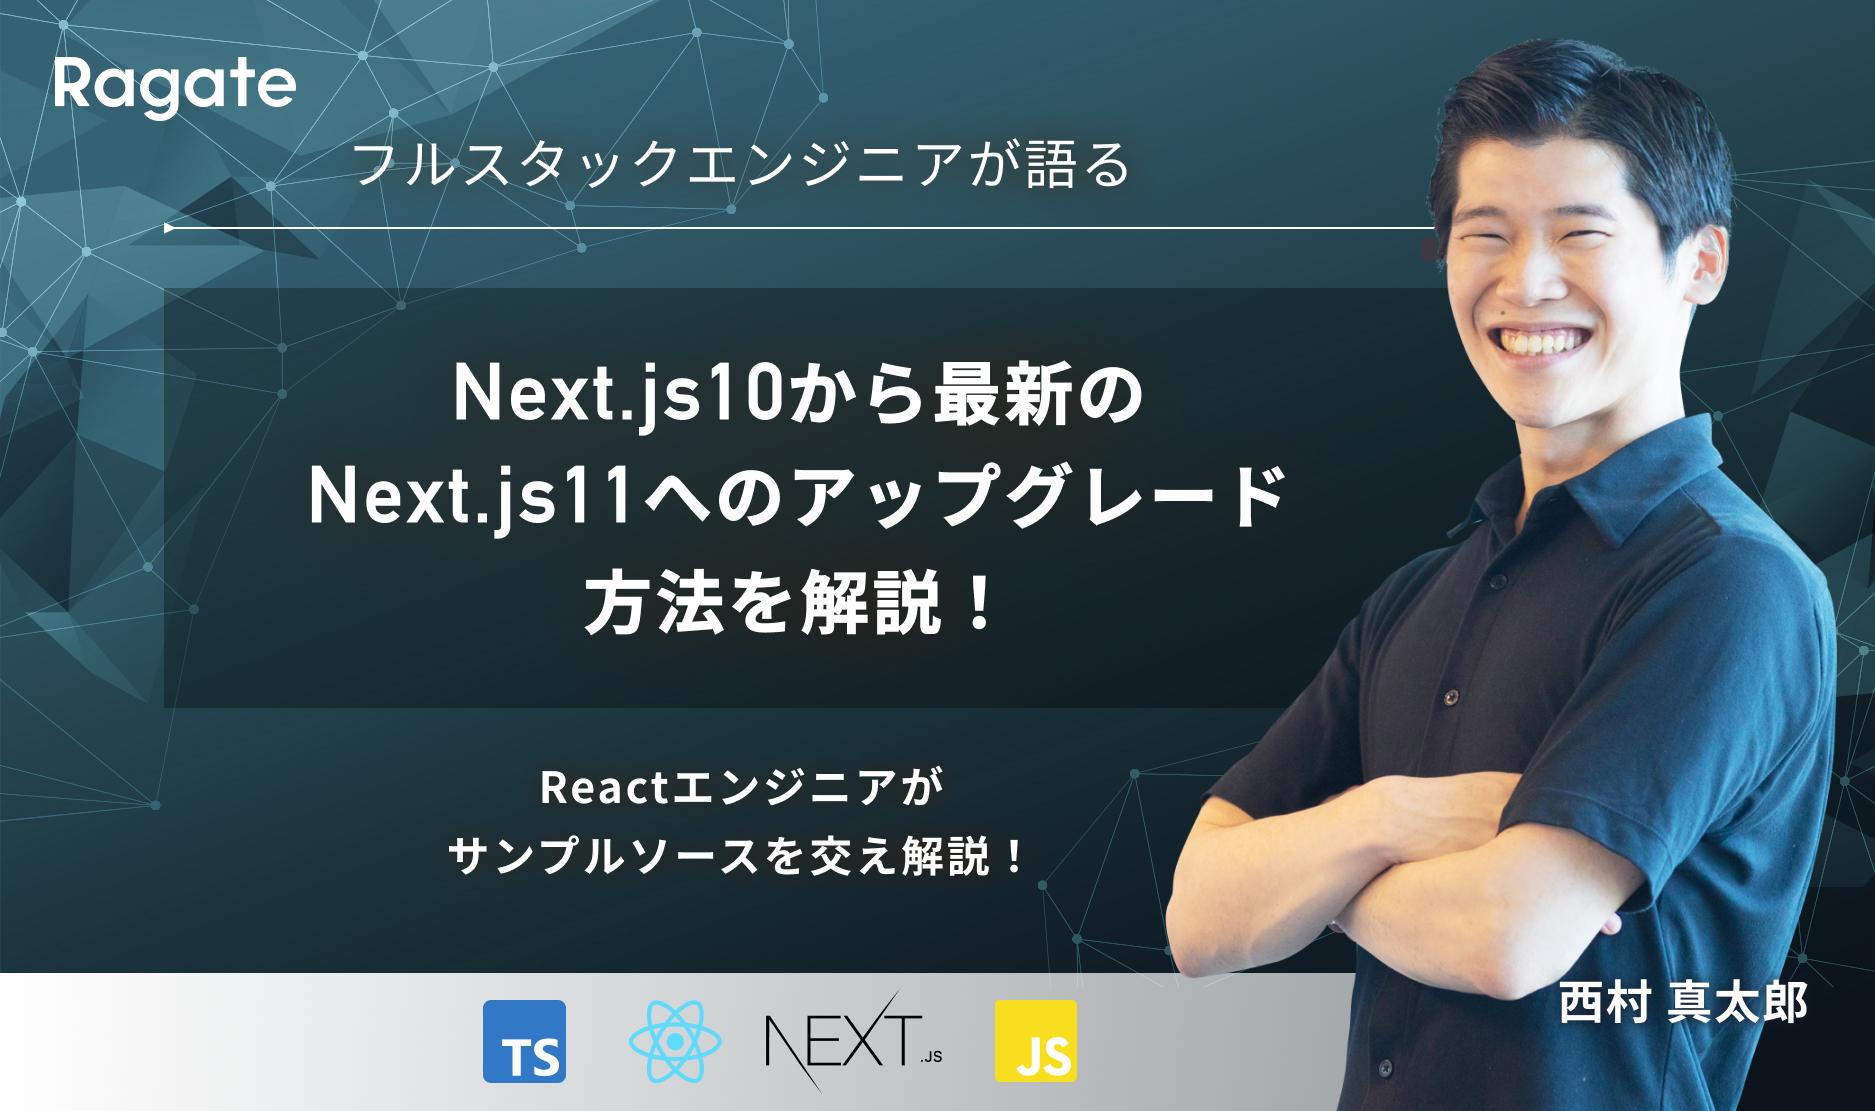 Next.js10から最新のNext.js11へのアップグレード方法を解説!Reactエンジニアがサンプルソースを交え解説!